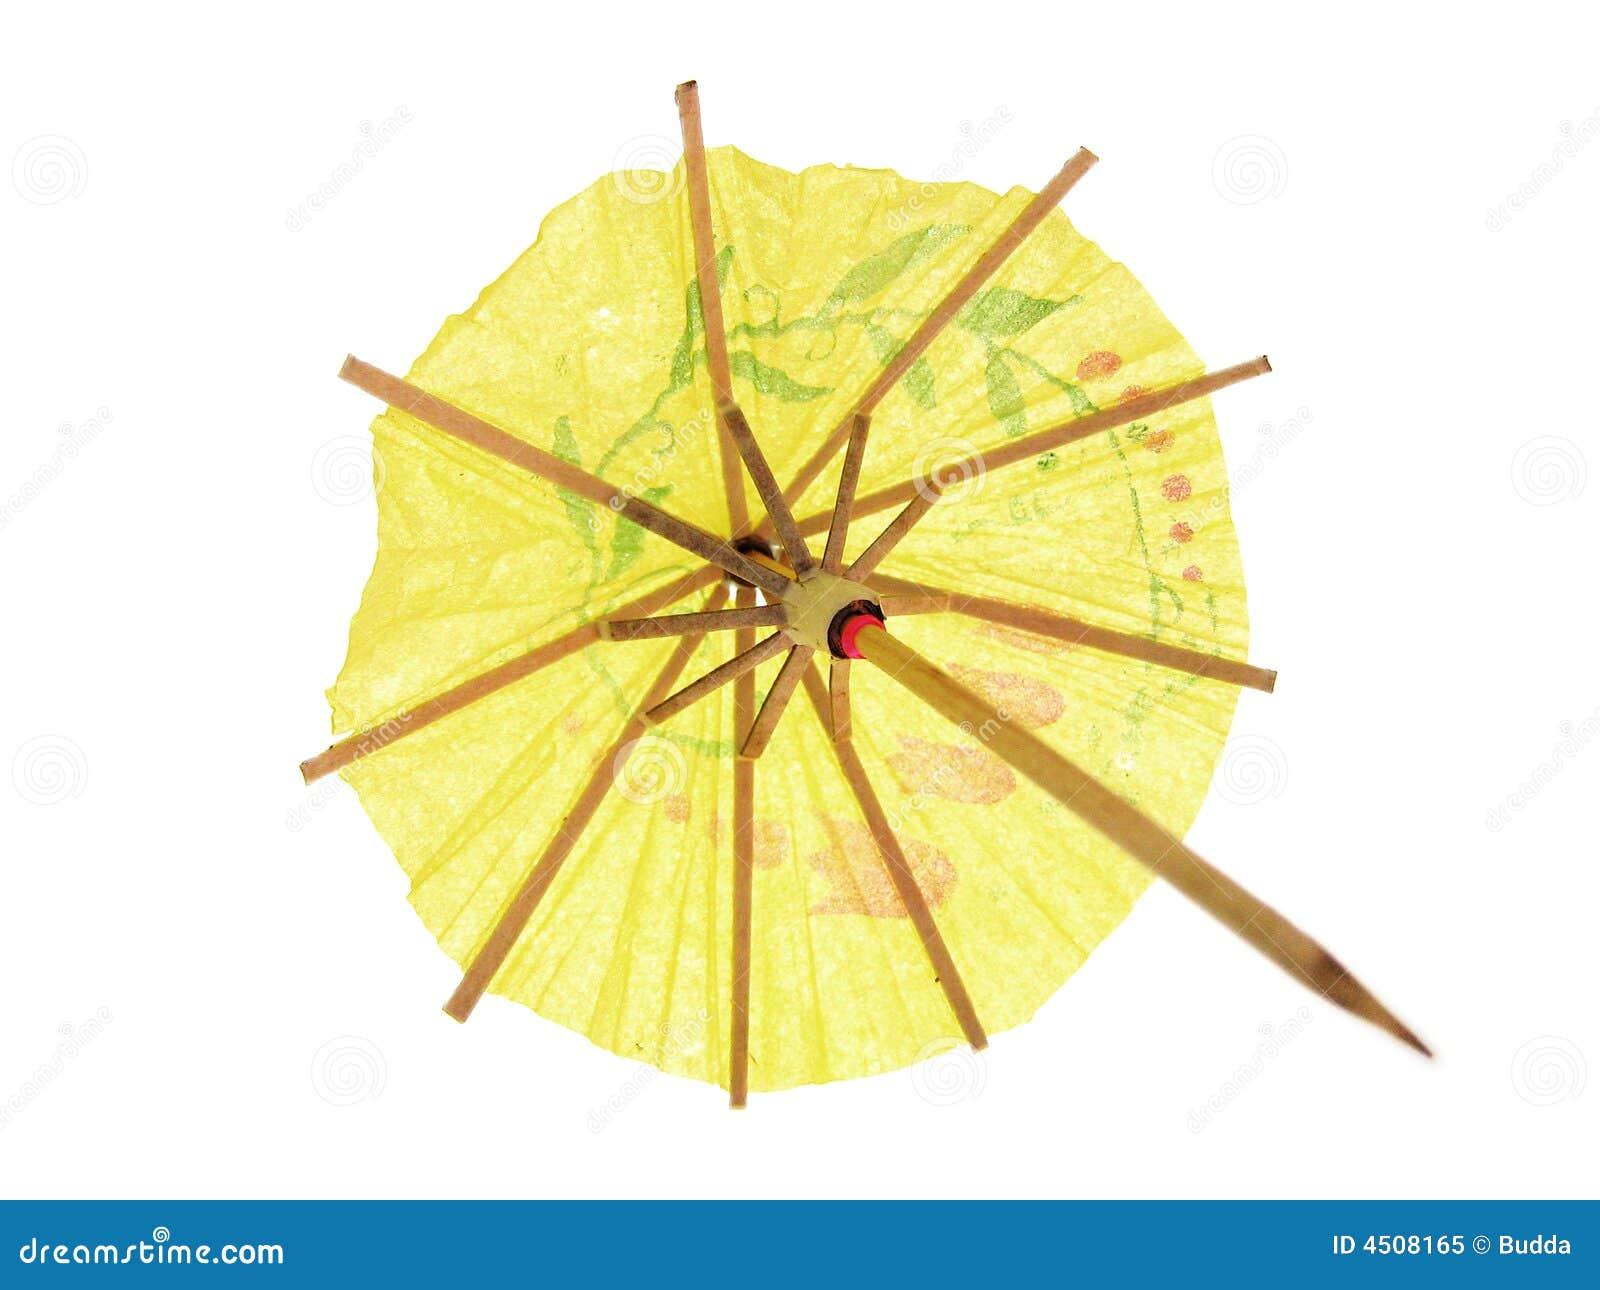 cocktail umbrella royalty free stock photo image 4508165